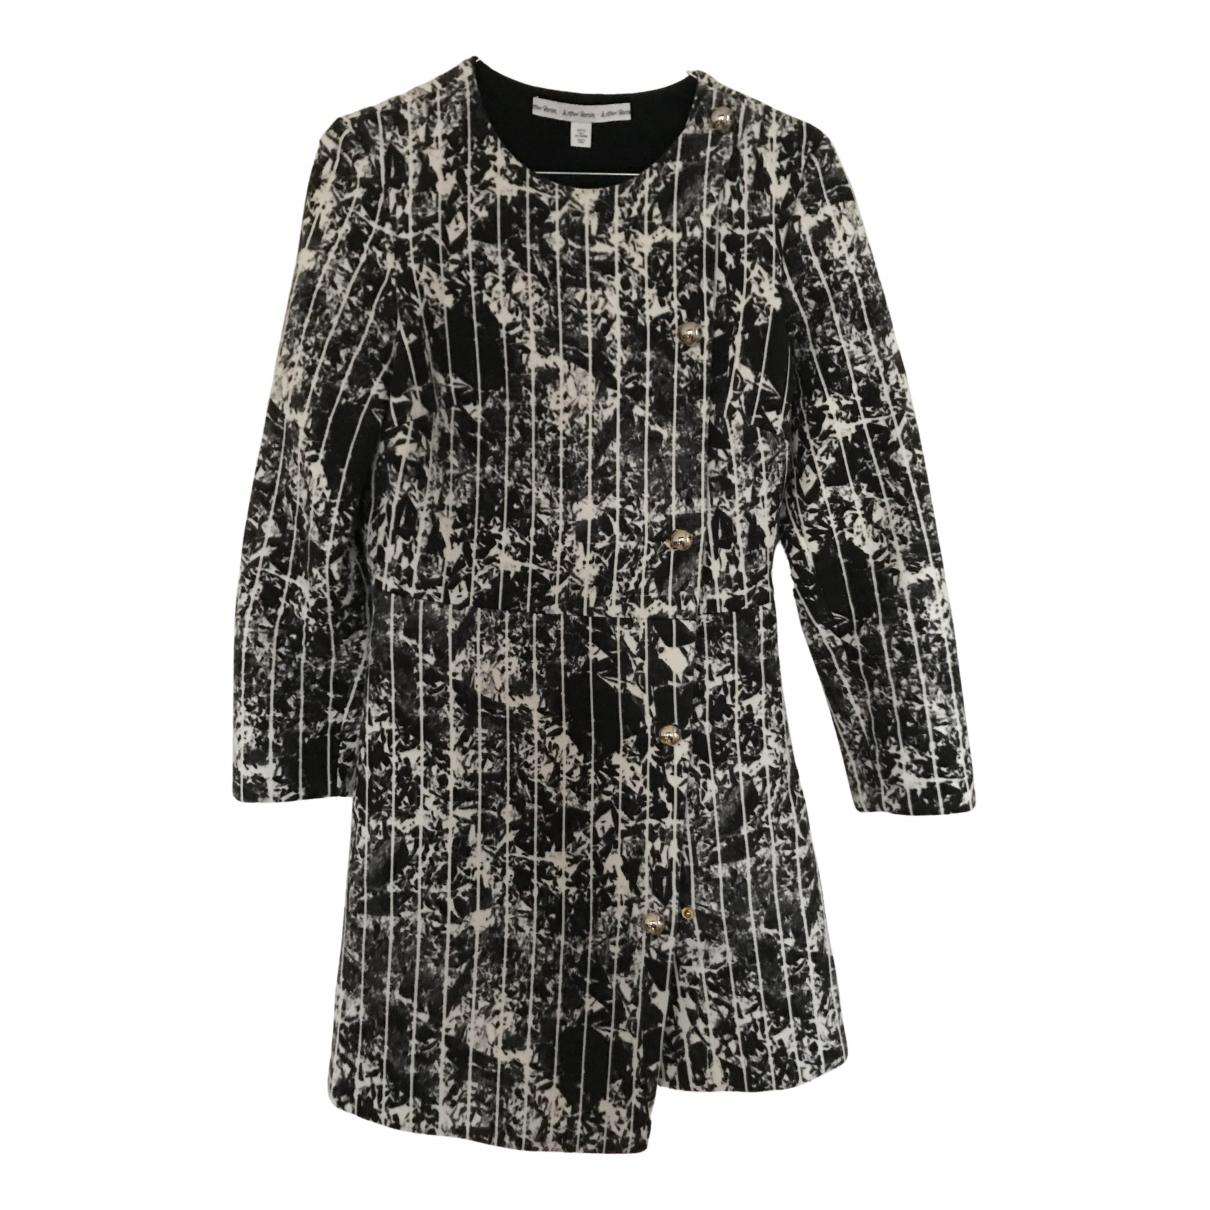 Mini vestido & Other Stories